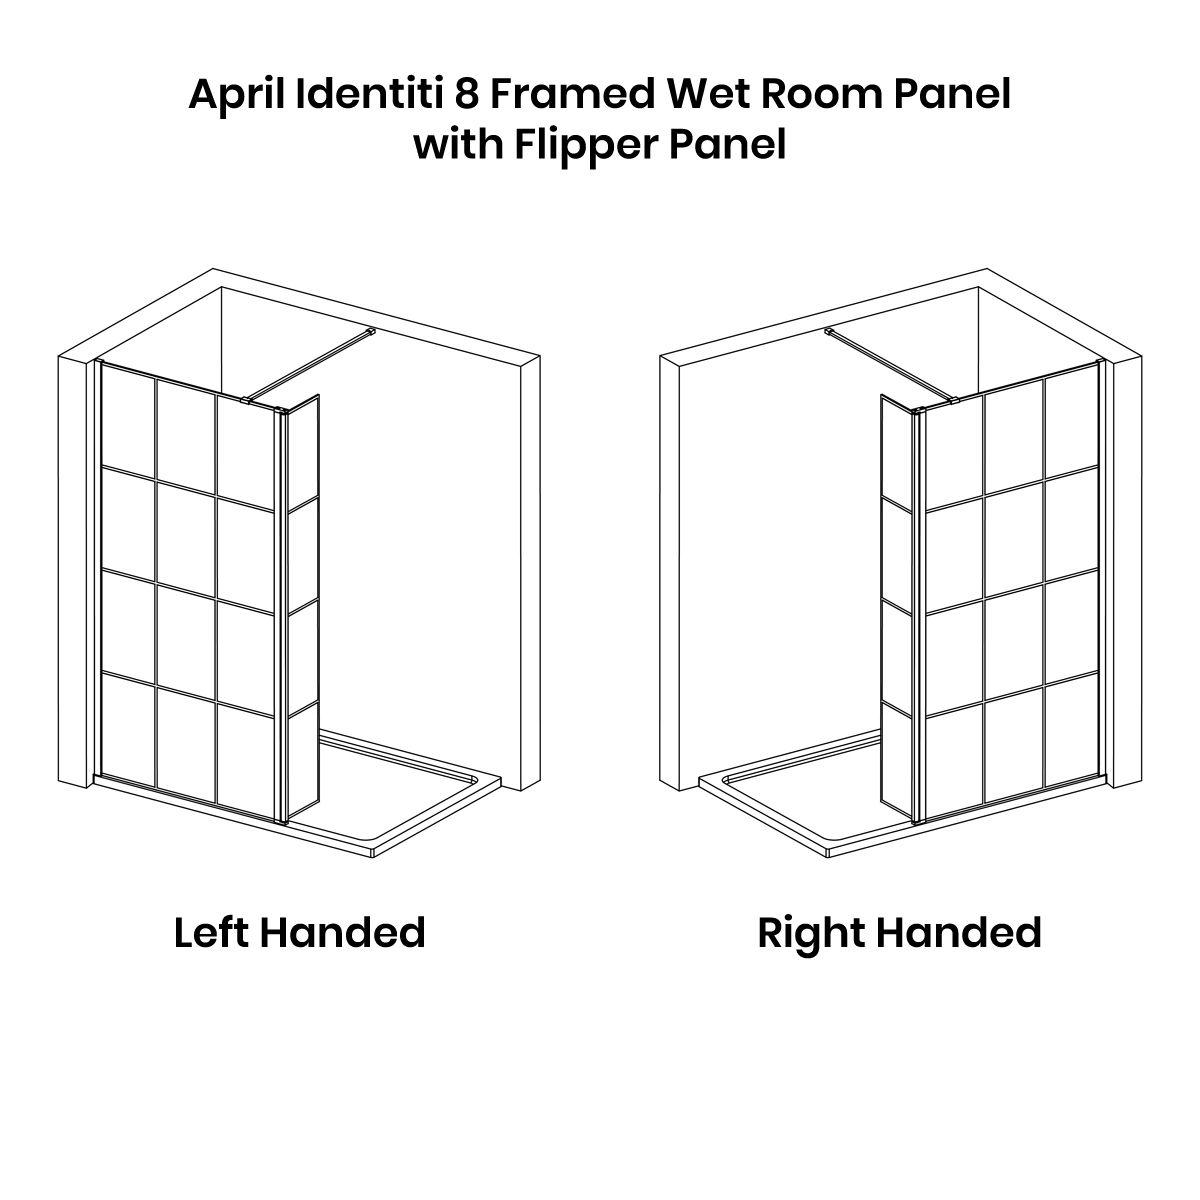 April Identiti 8 Framed Black Matrix Wet Room Shower Enclosure with Flipper Panel